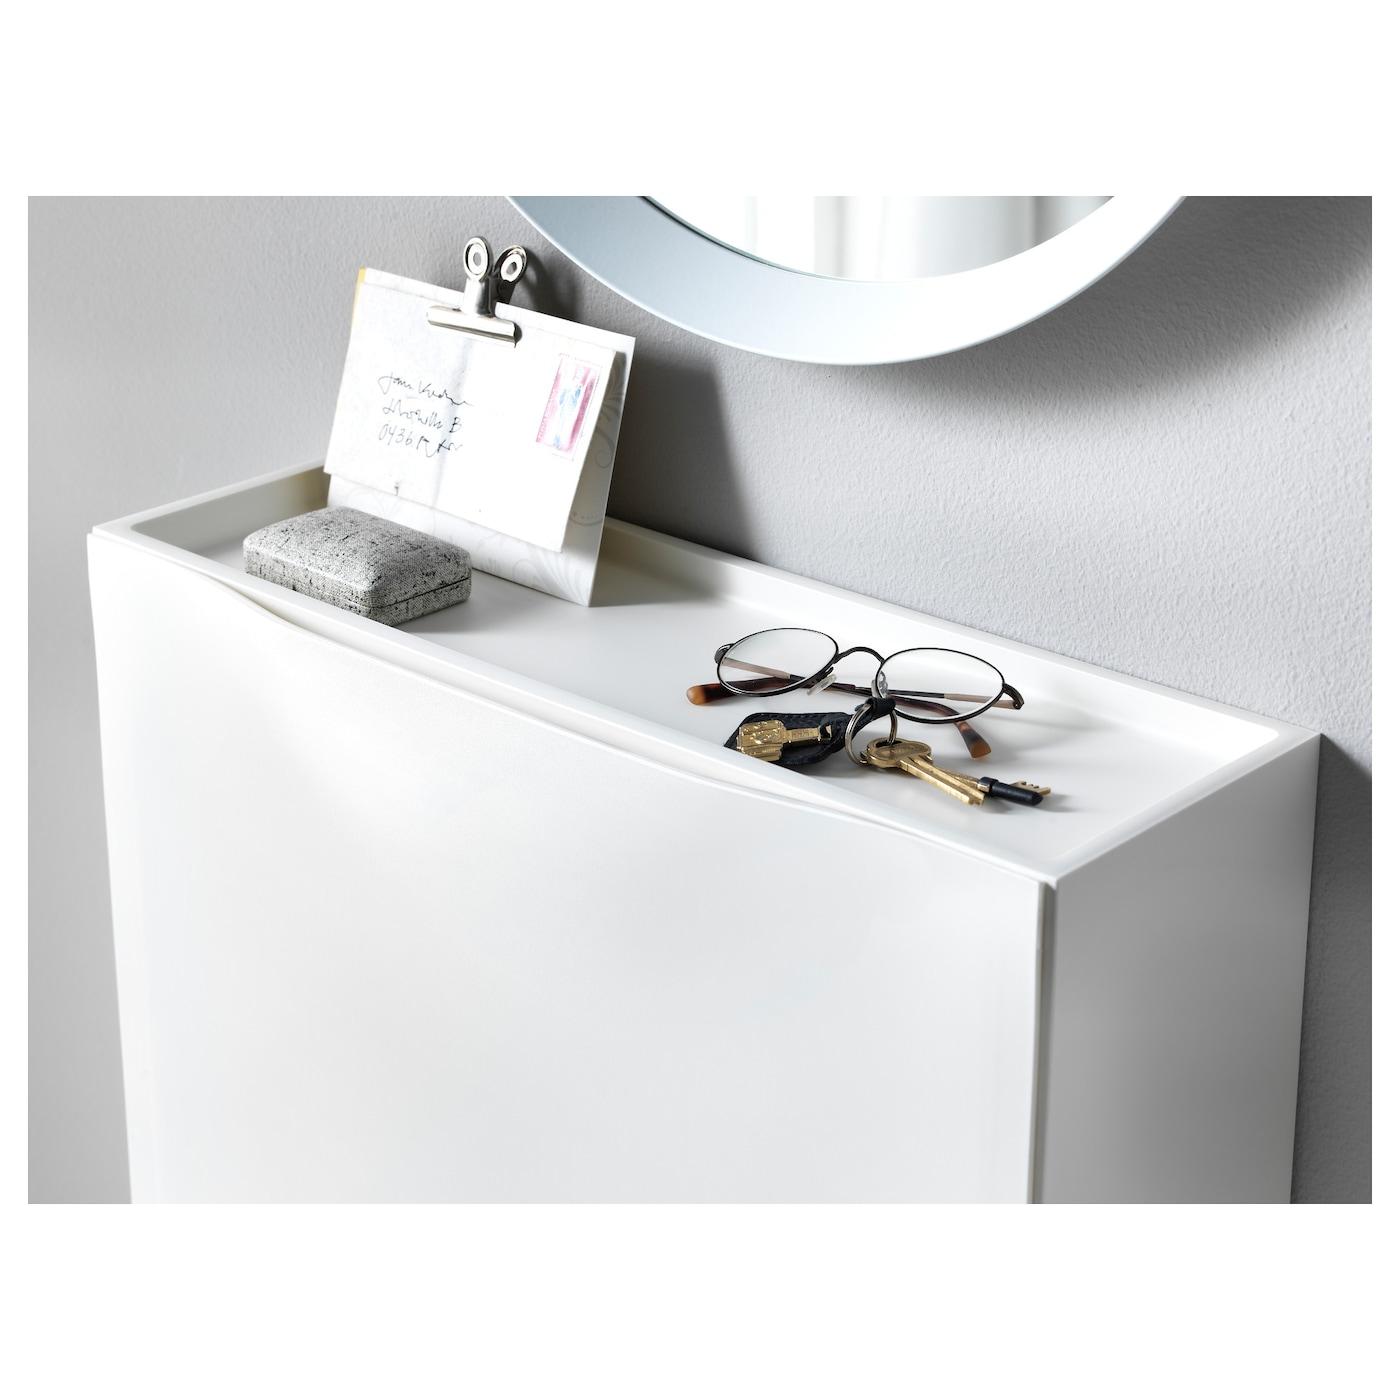 trones shoe cabinet storage white 51x39 cm ikea. Black Bedroom Furniture Sets. Home Design Ideas